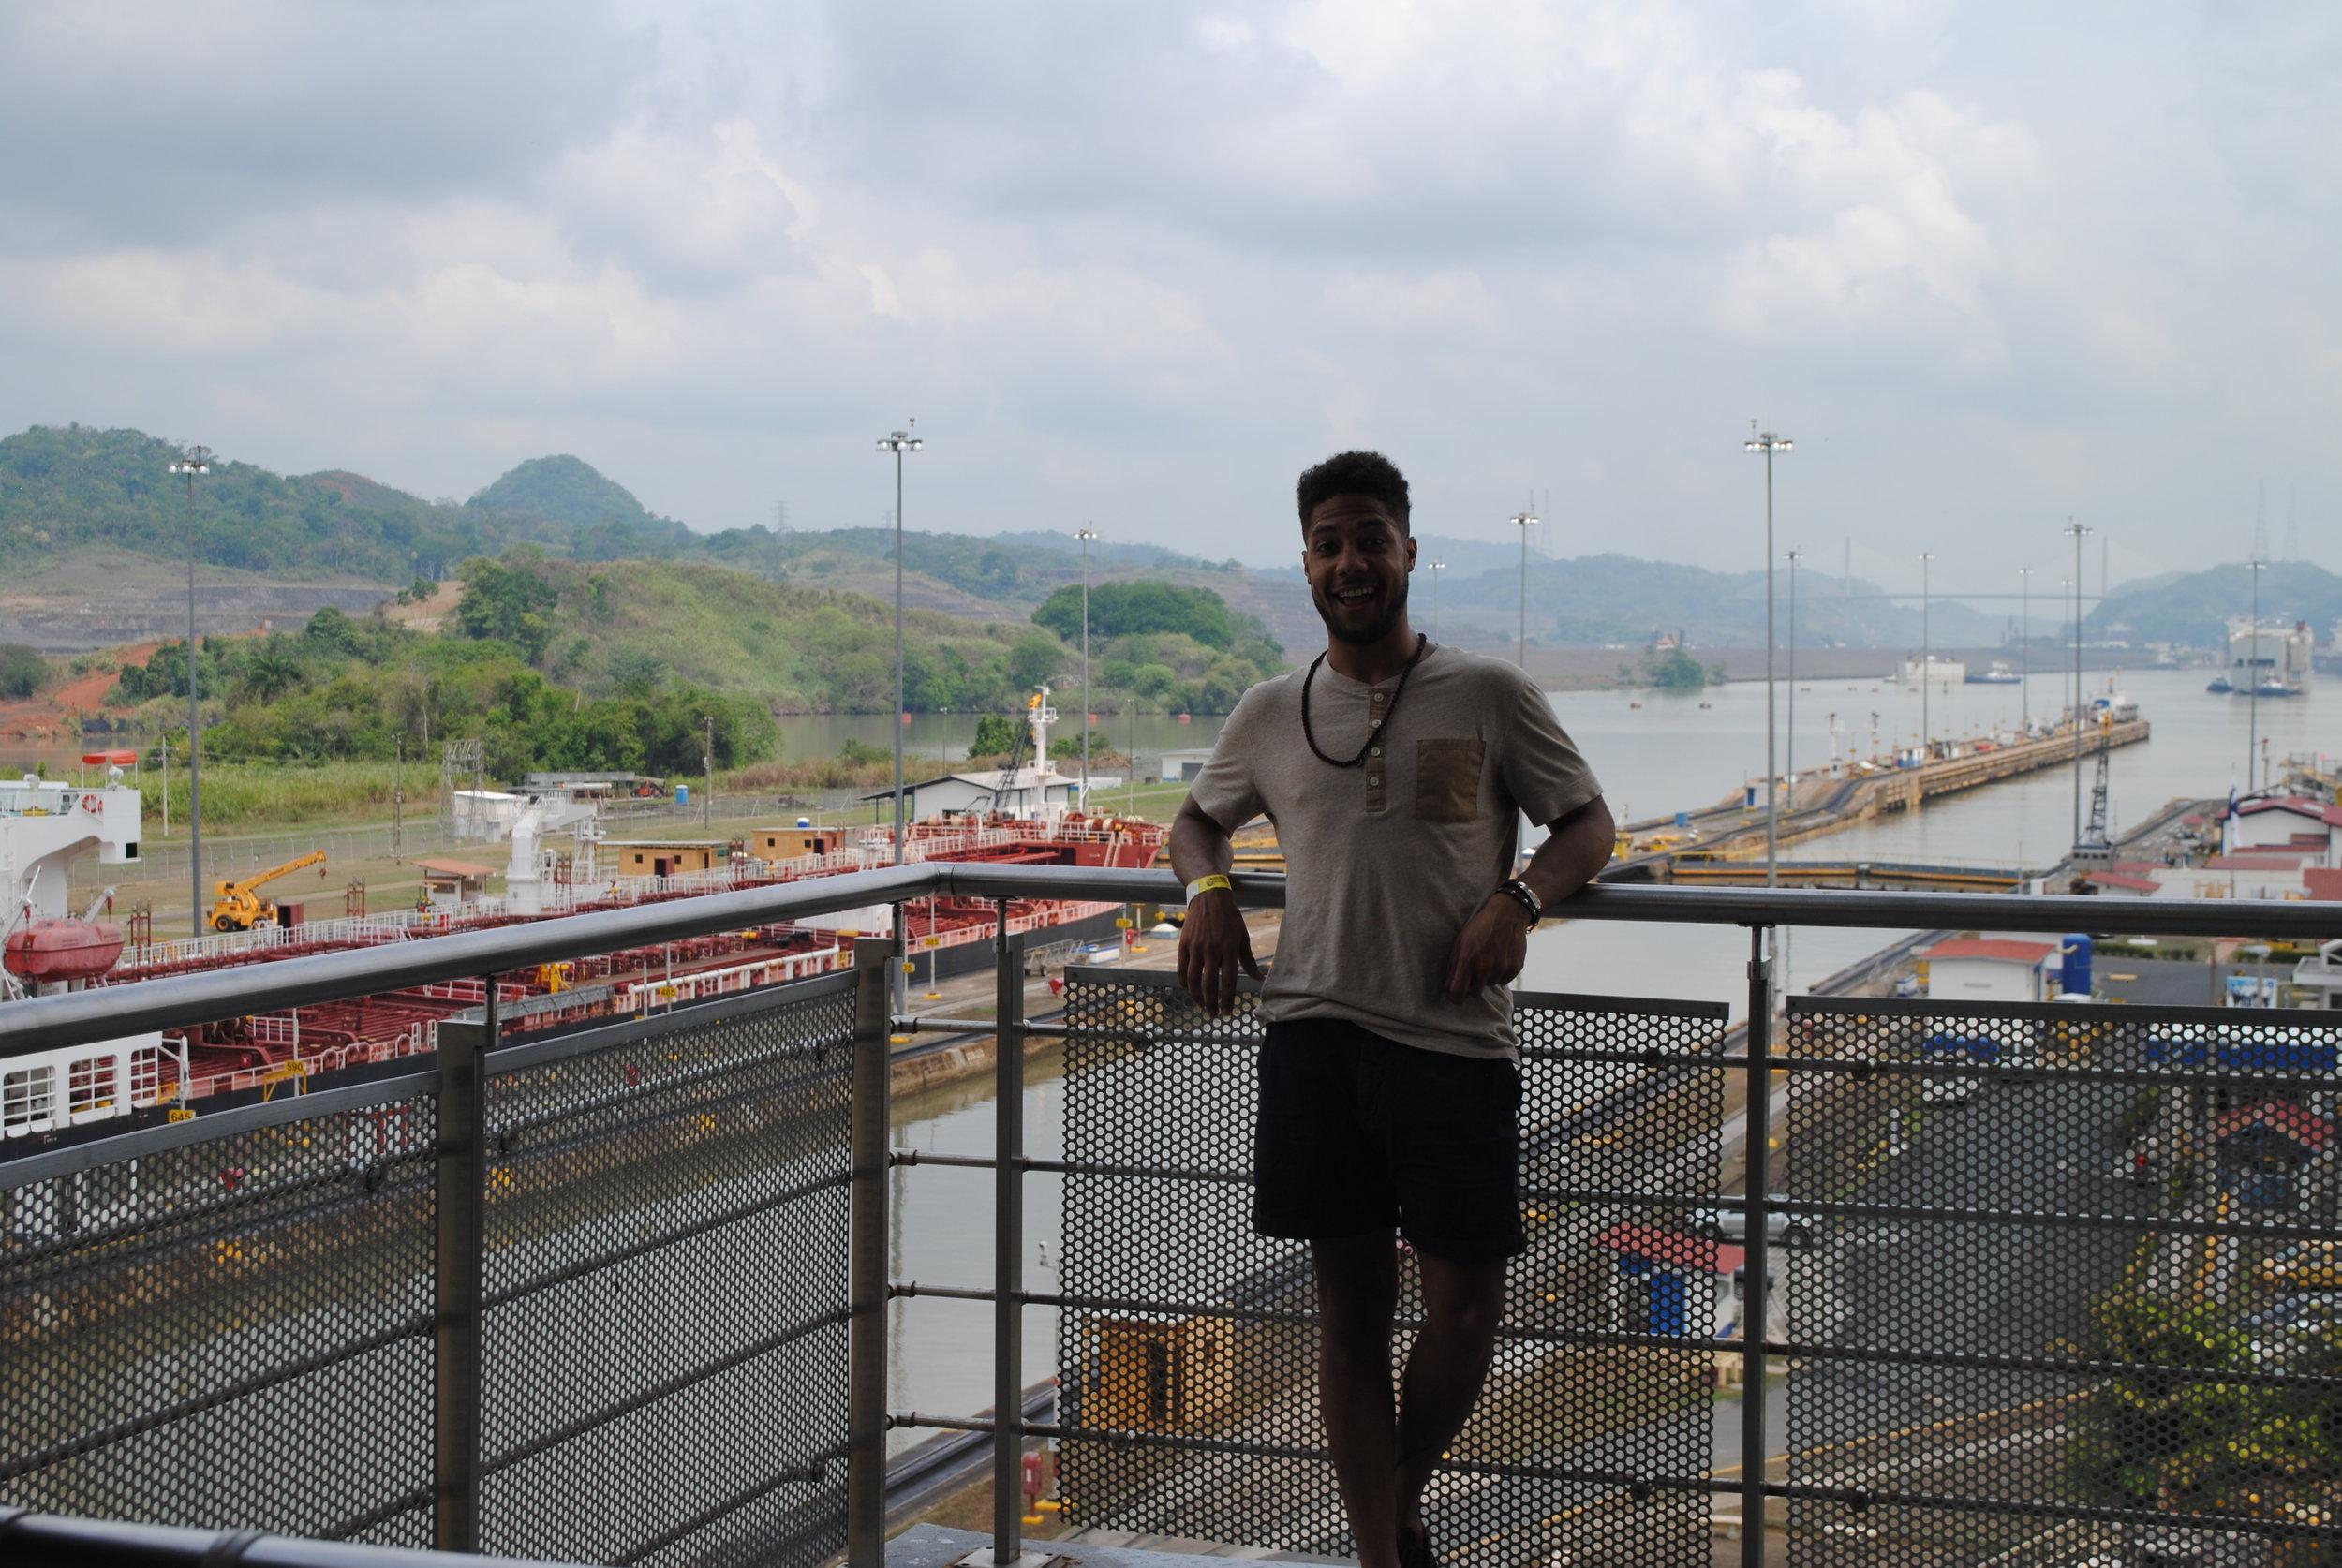 Me being safe at the Miraflores Locks, Panama